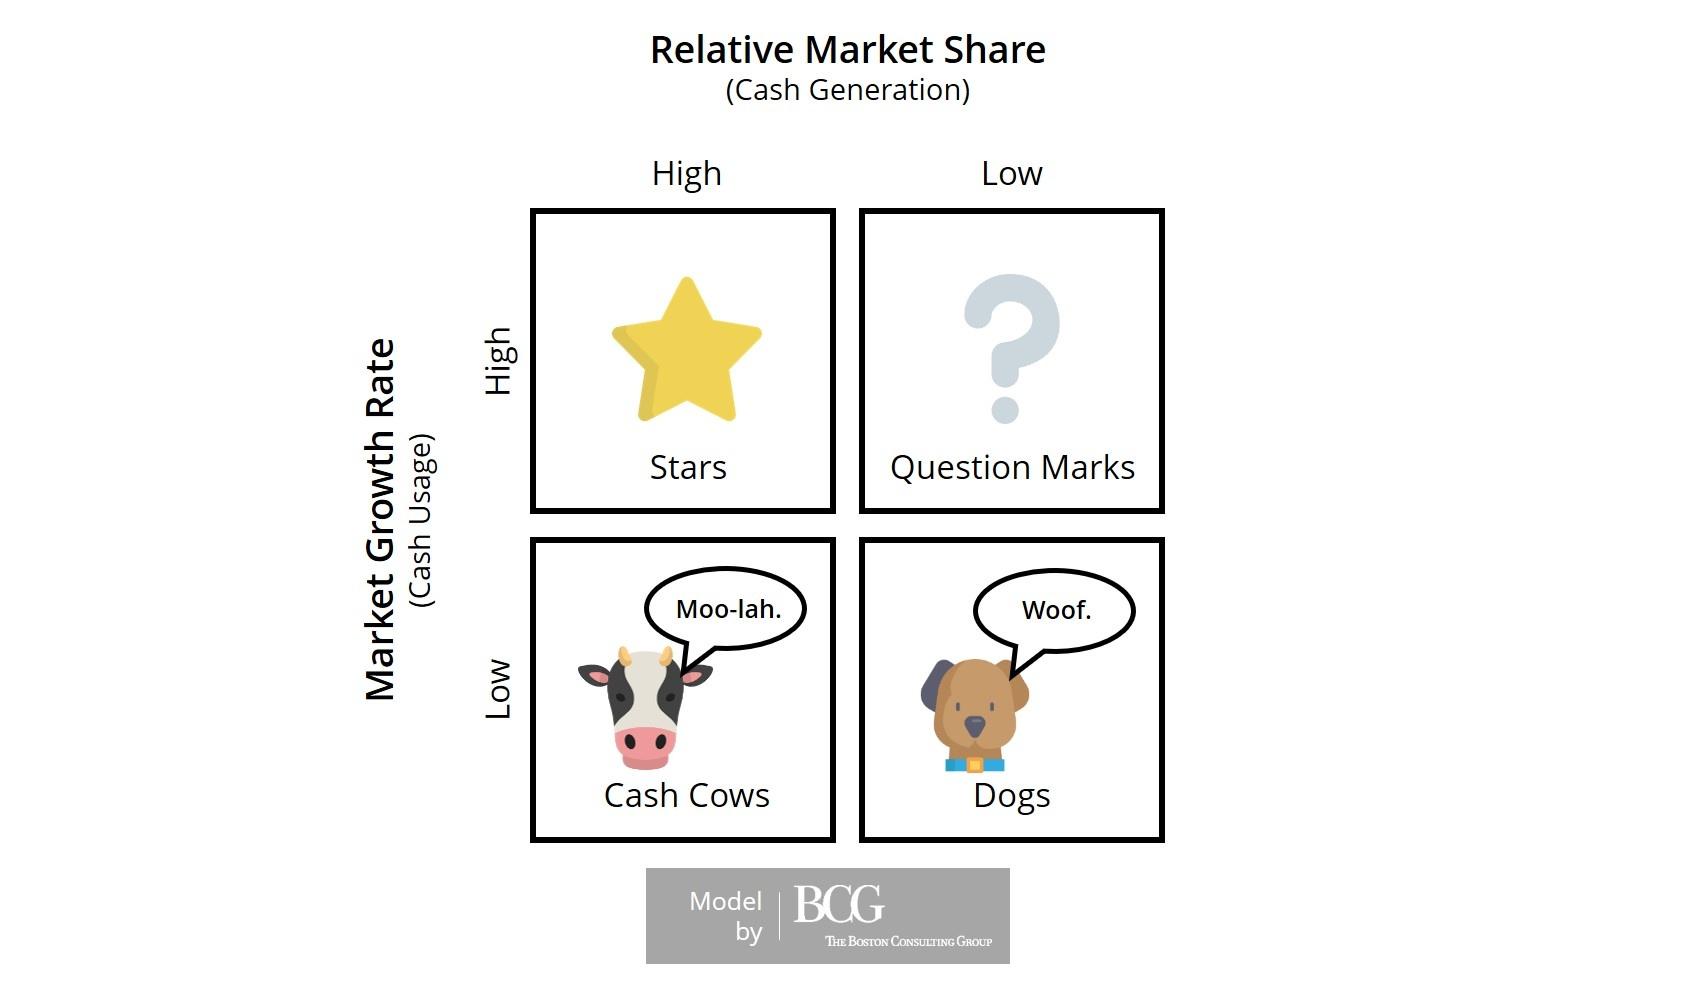 BCG focusing efforts model